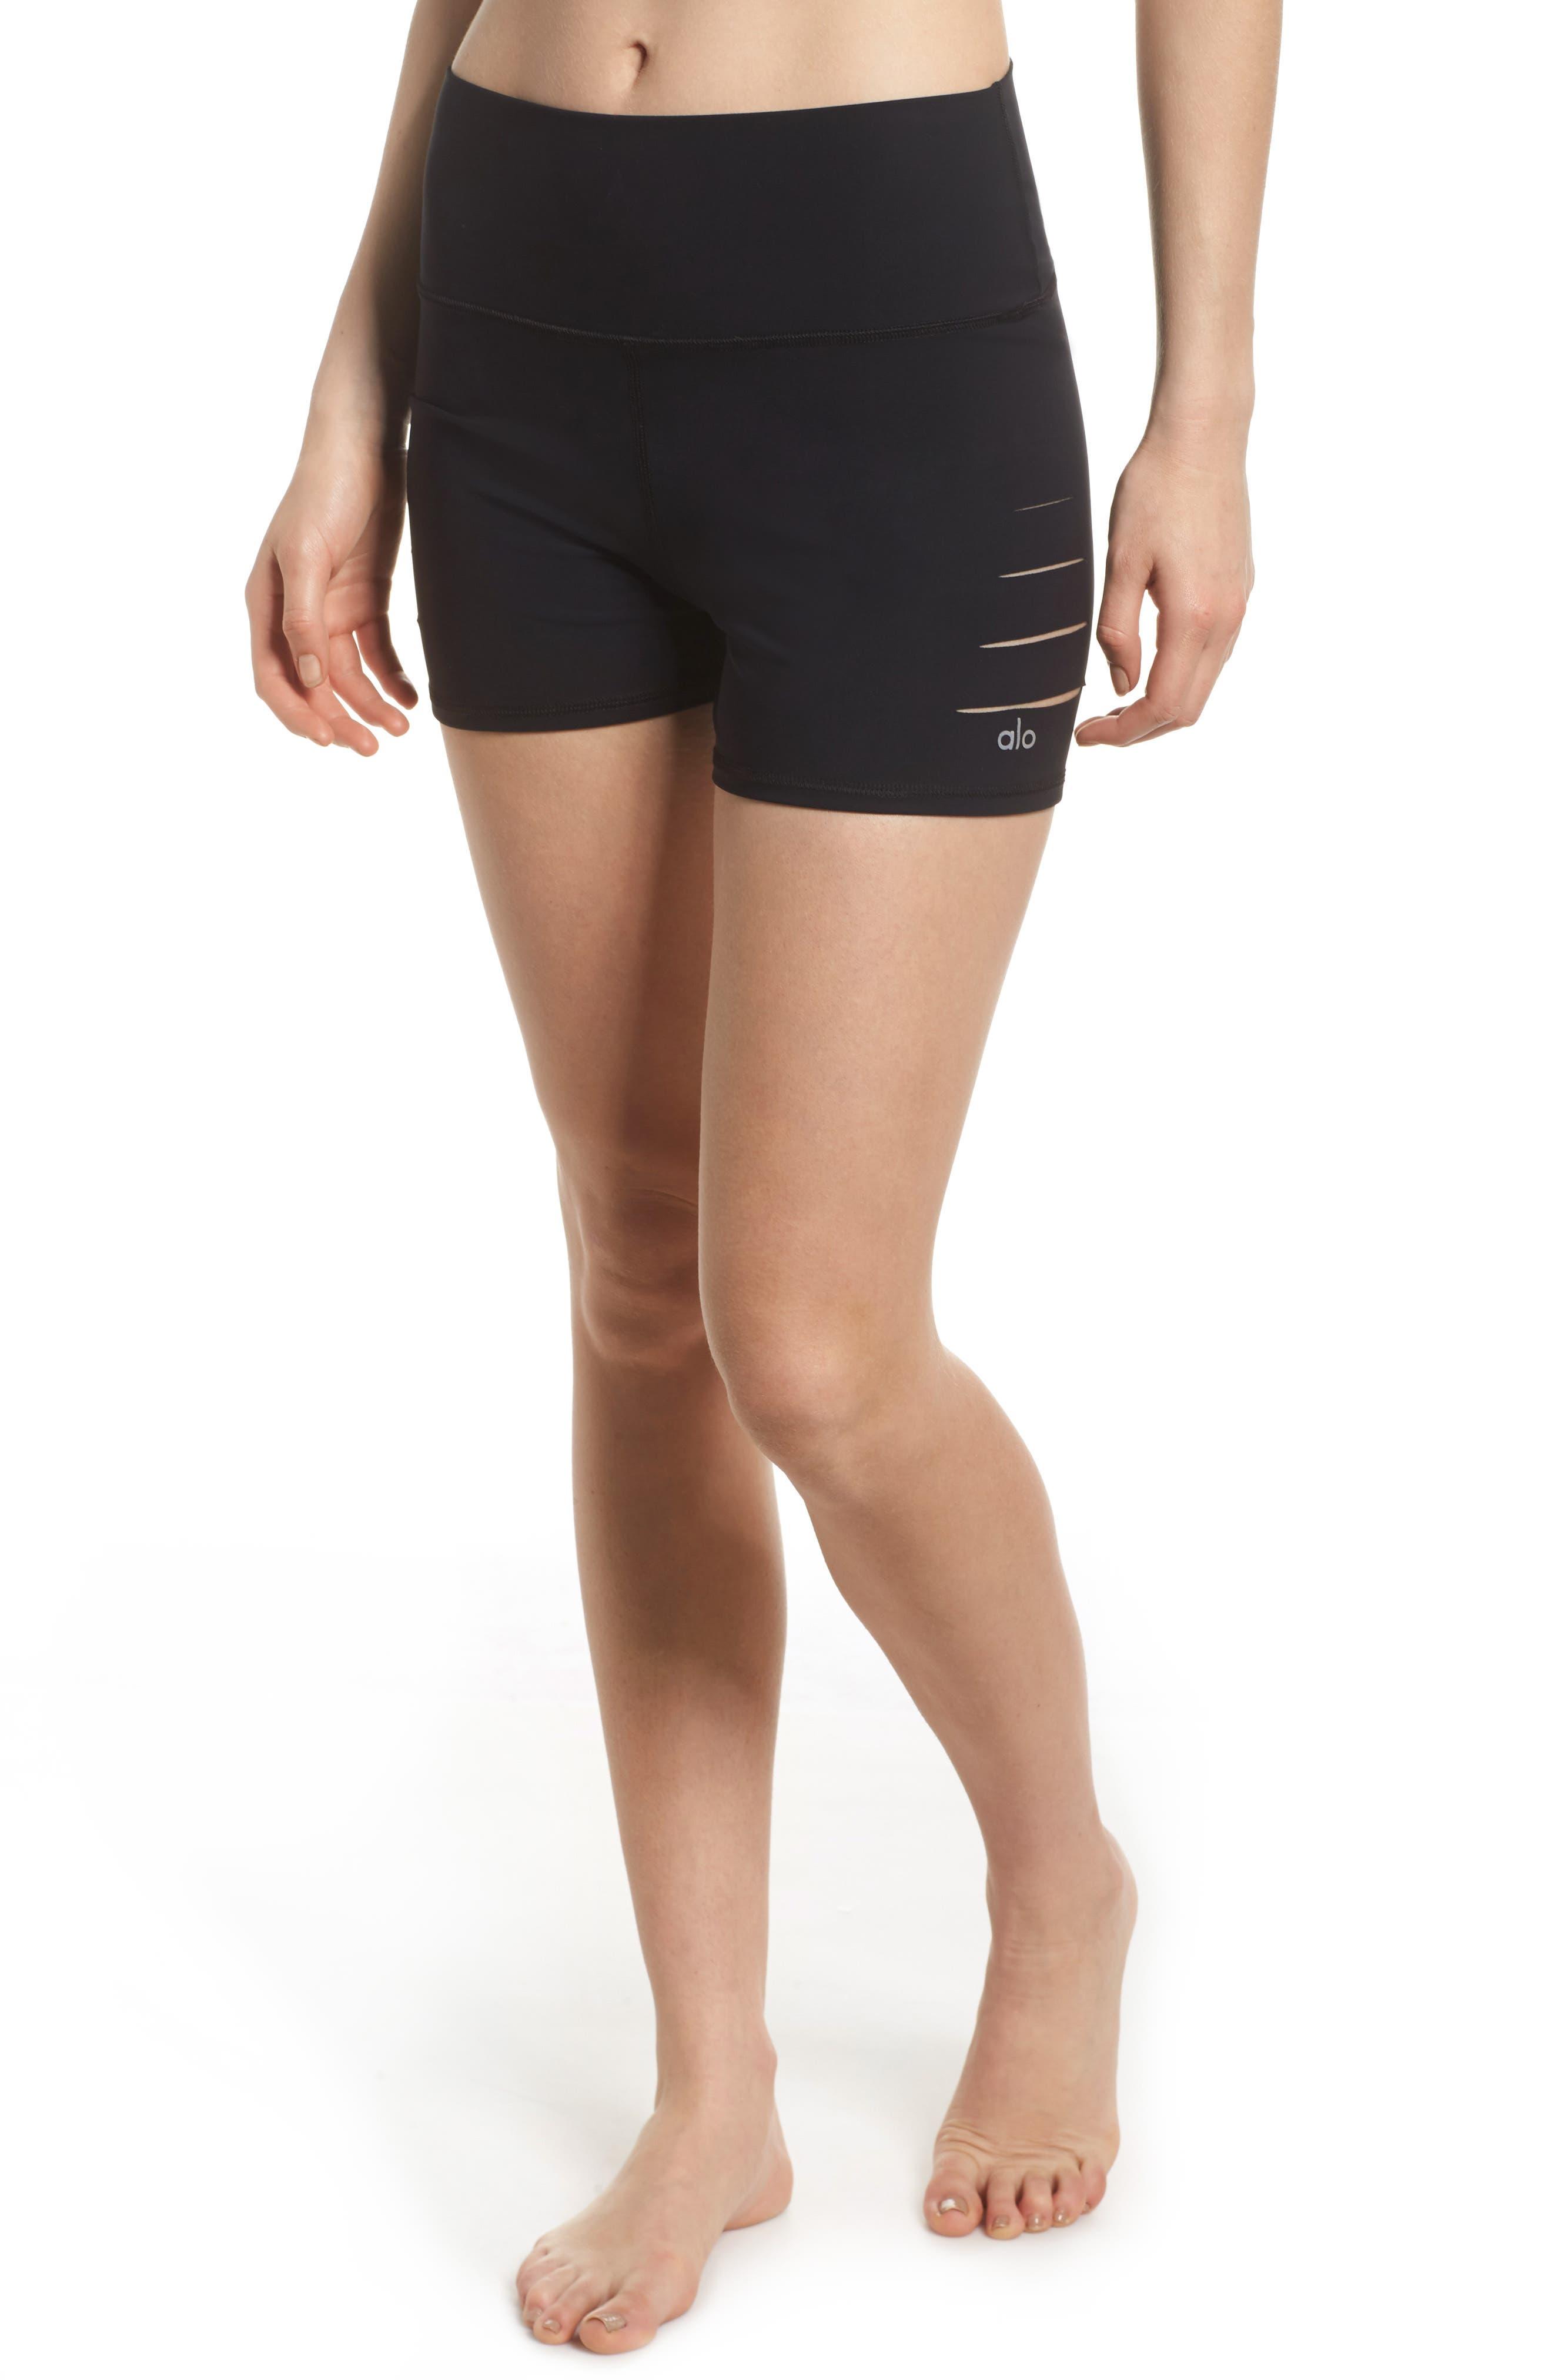 ALO, Ripped High Waist Shorts, Main thumbnail 1, color, BLACK